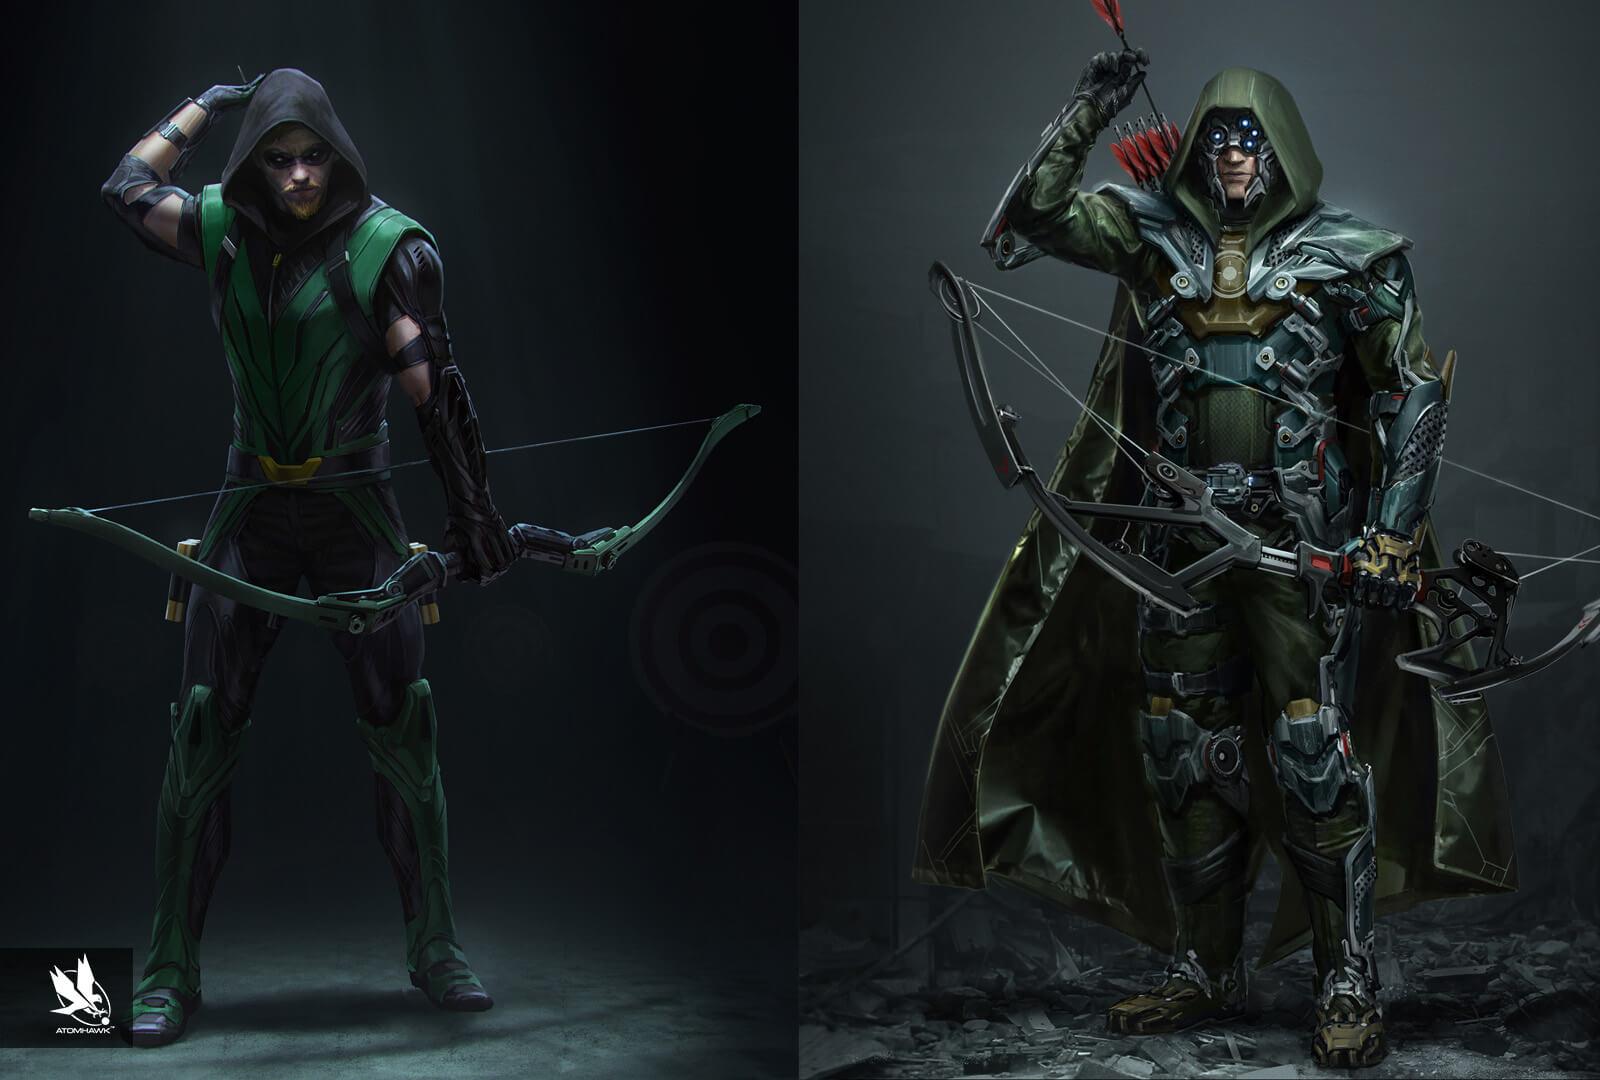 Atomhawk_Warner-Bros-NetherRealm_Injustice-2_Concept-Art_Character-Design_Green-Arrow.jpg